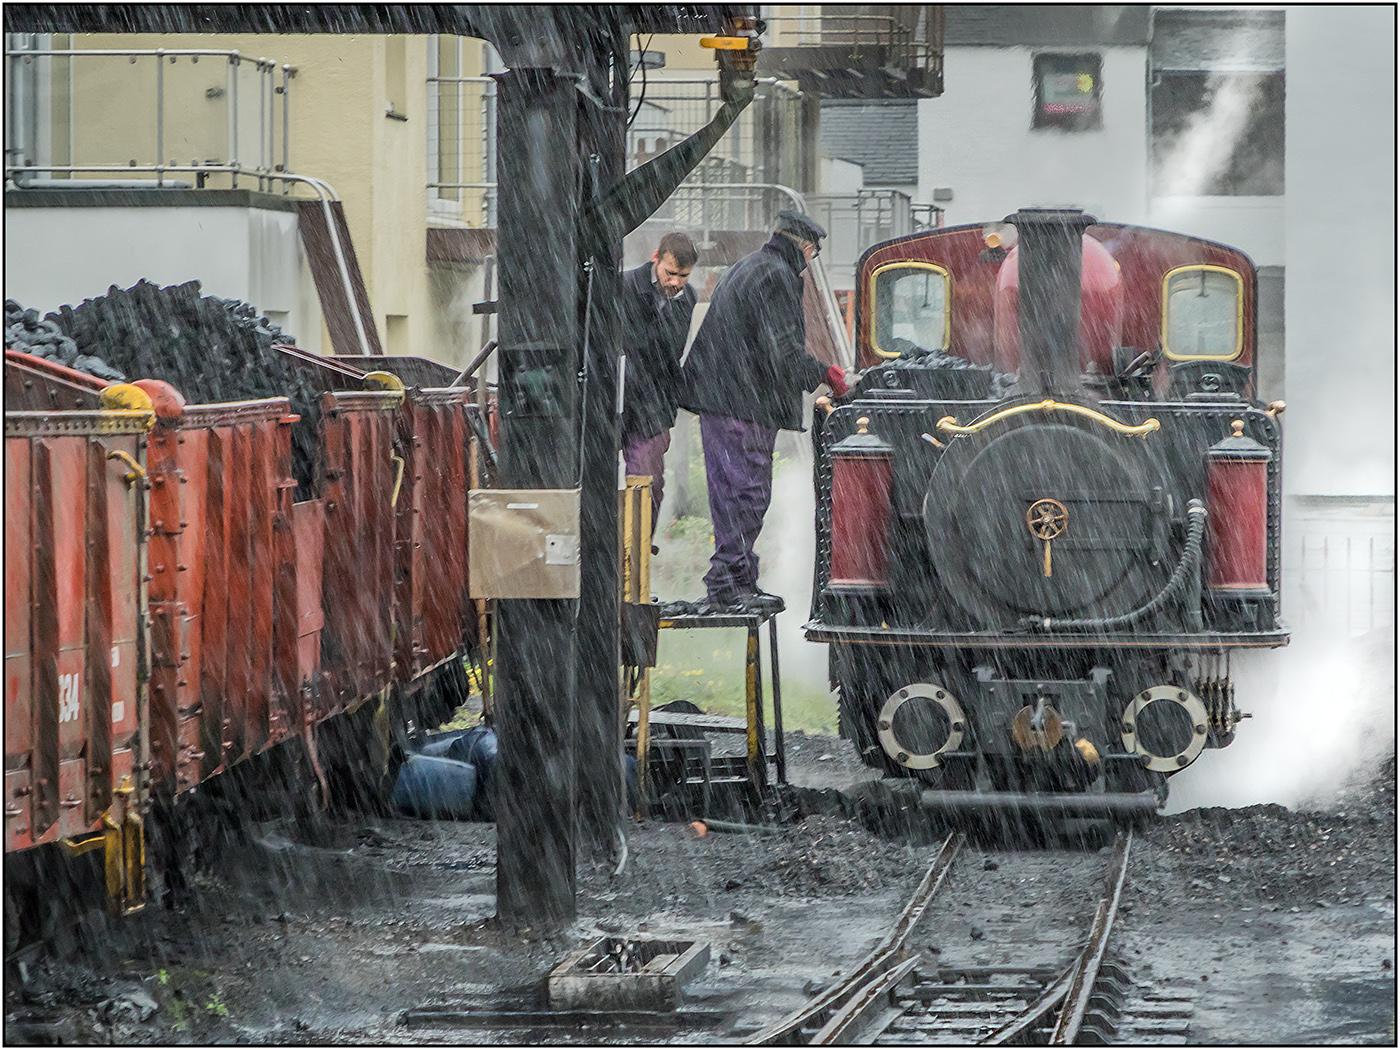 Just Coaling in the Rain